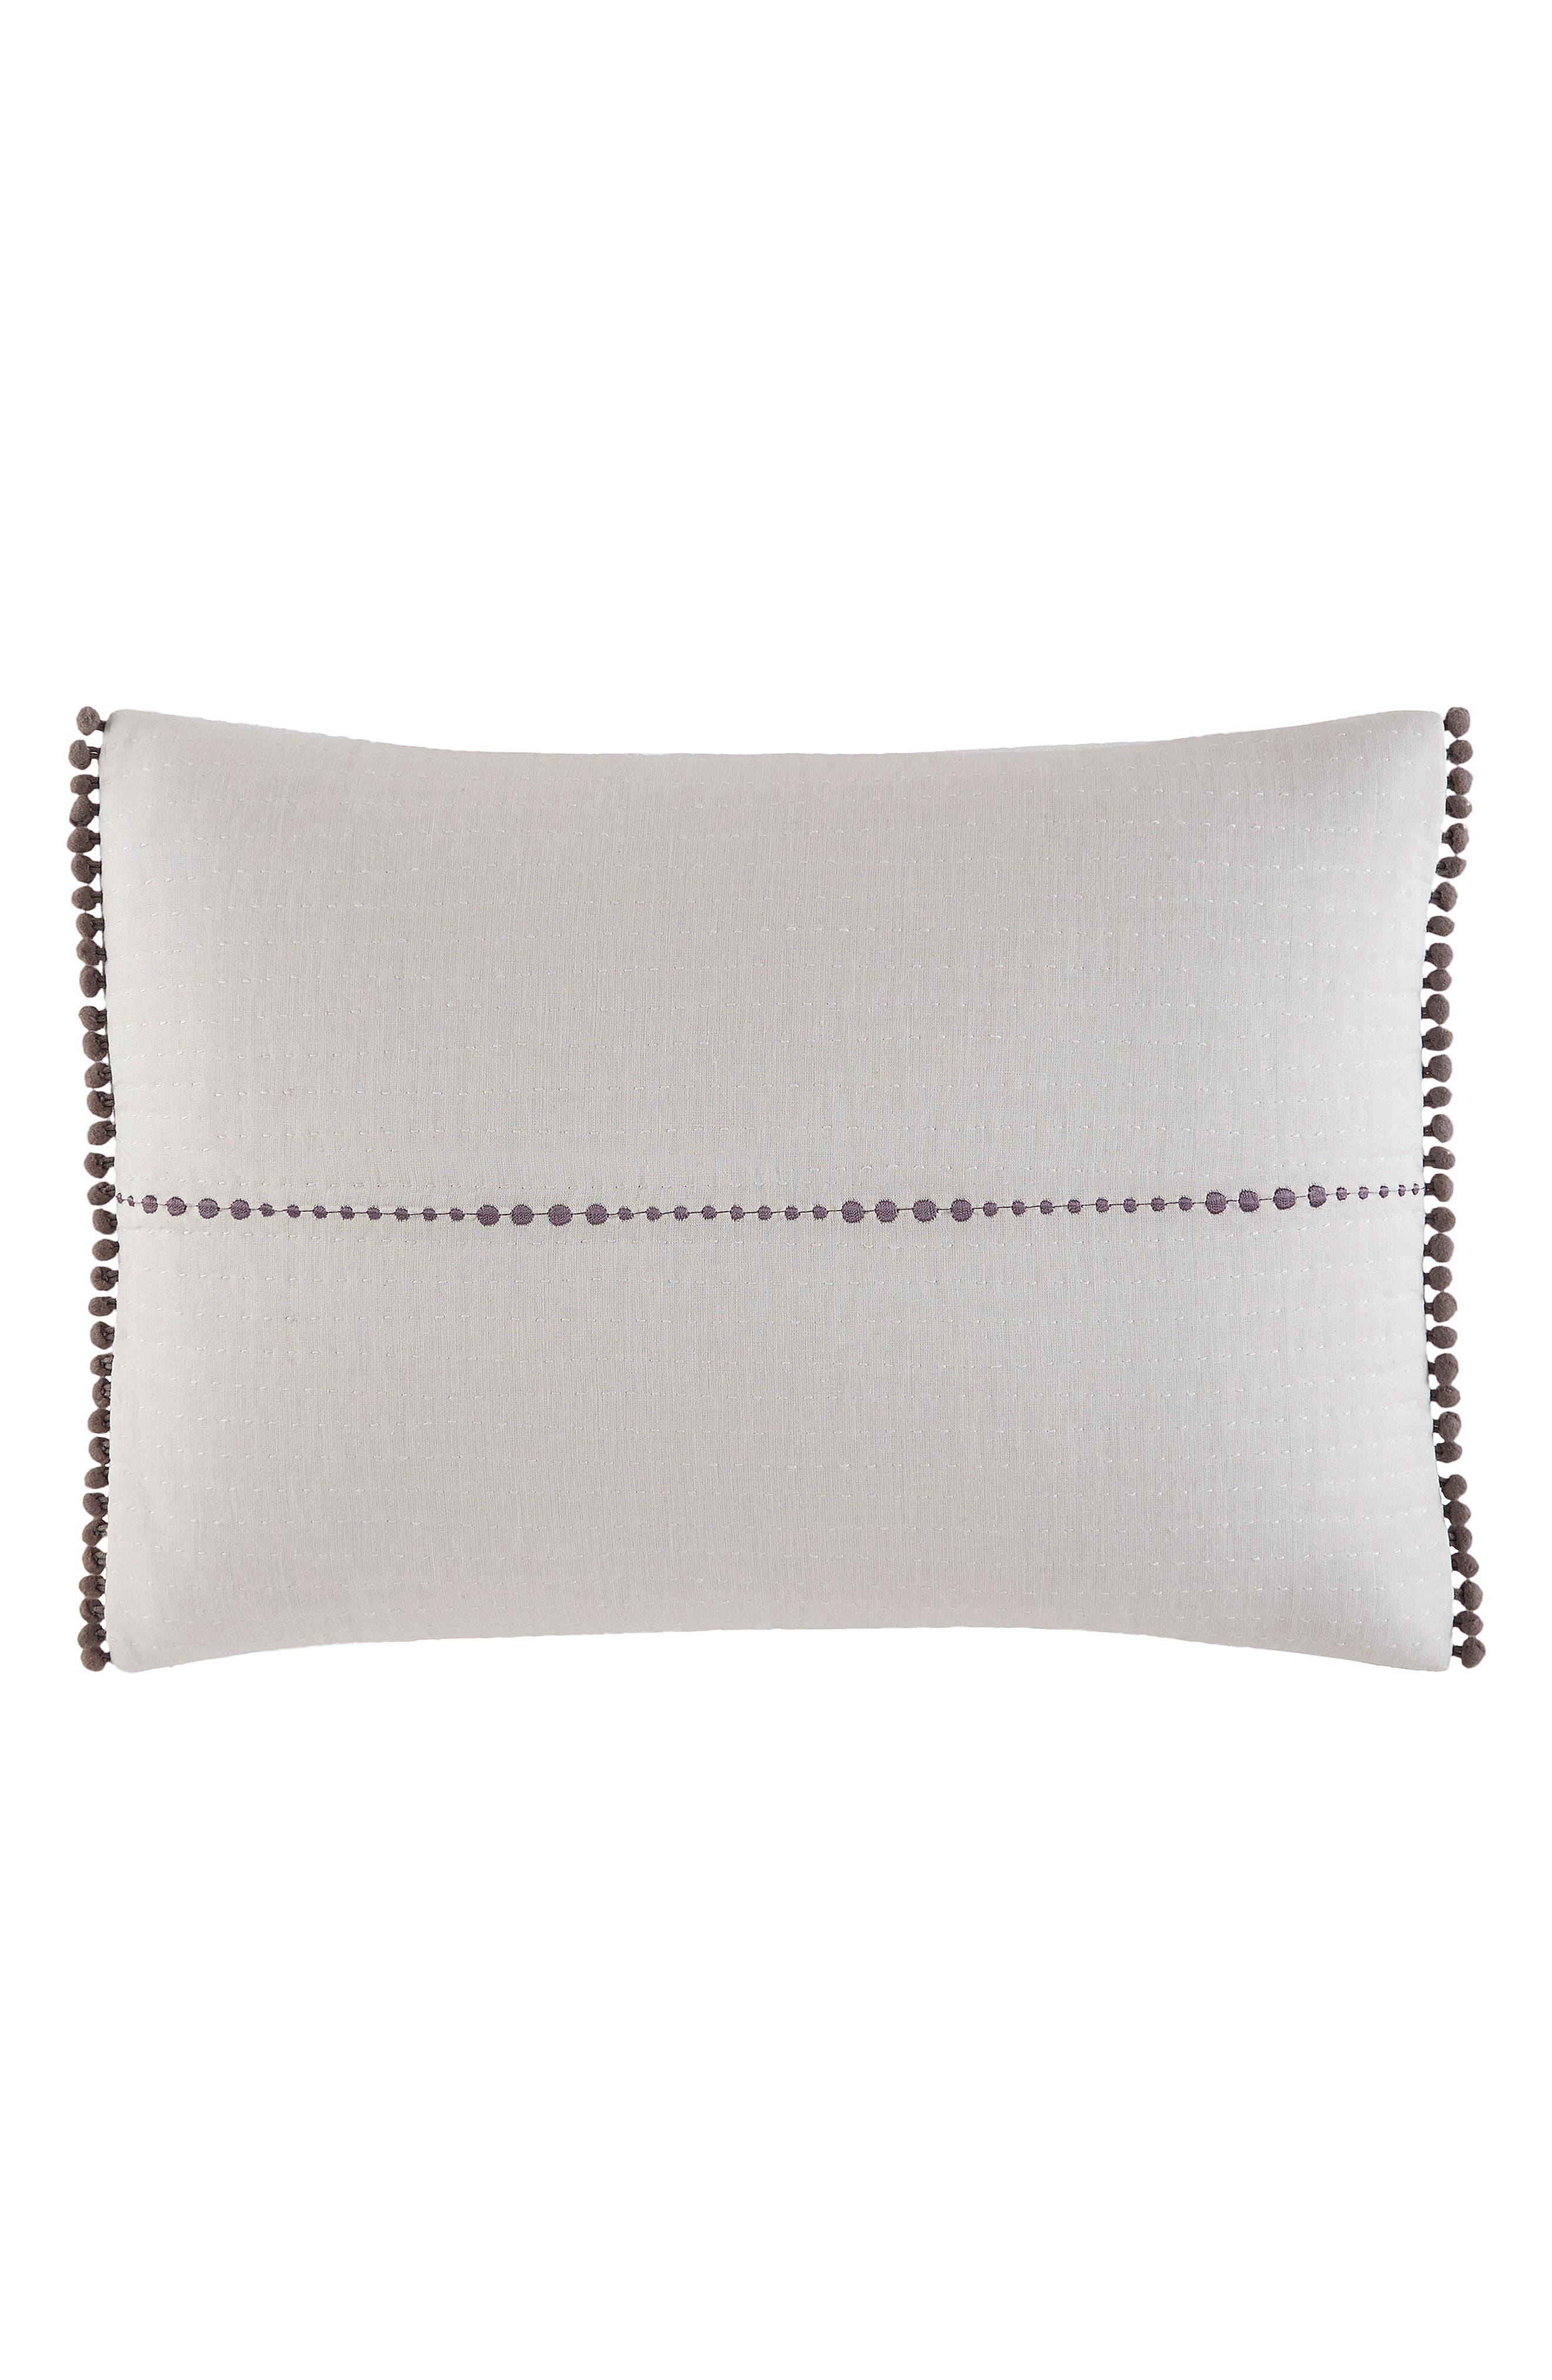 Alternate Image 1 Selected - ED Ellen DeGeneres Greystone Accent Pillow